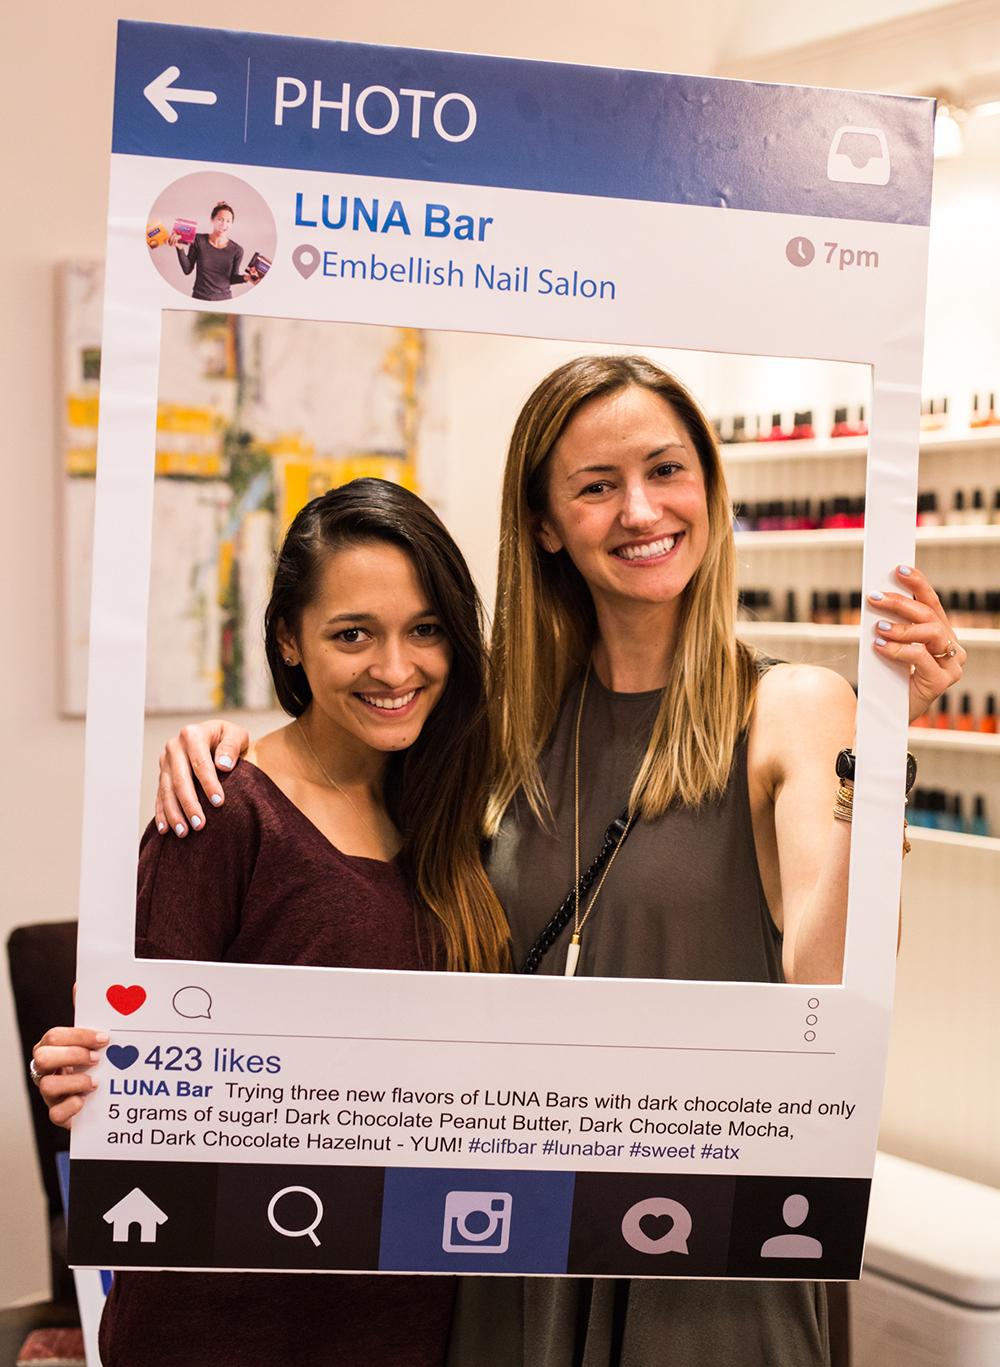 livvyland-blog-luna-bar-clif-event-embellish-nail-salon-anderson-austin-texas-fashion-blog-nail-salon-best-boutique-10-copy